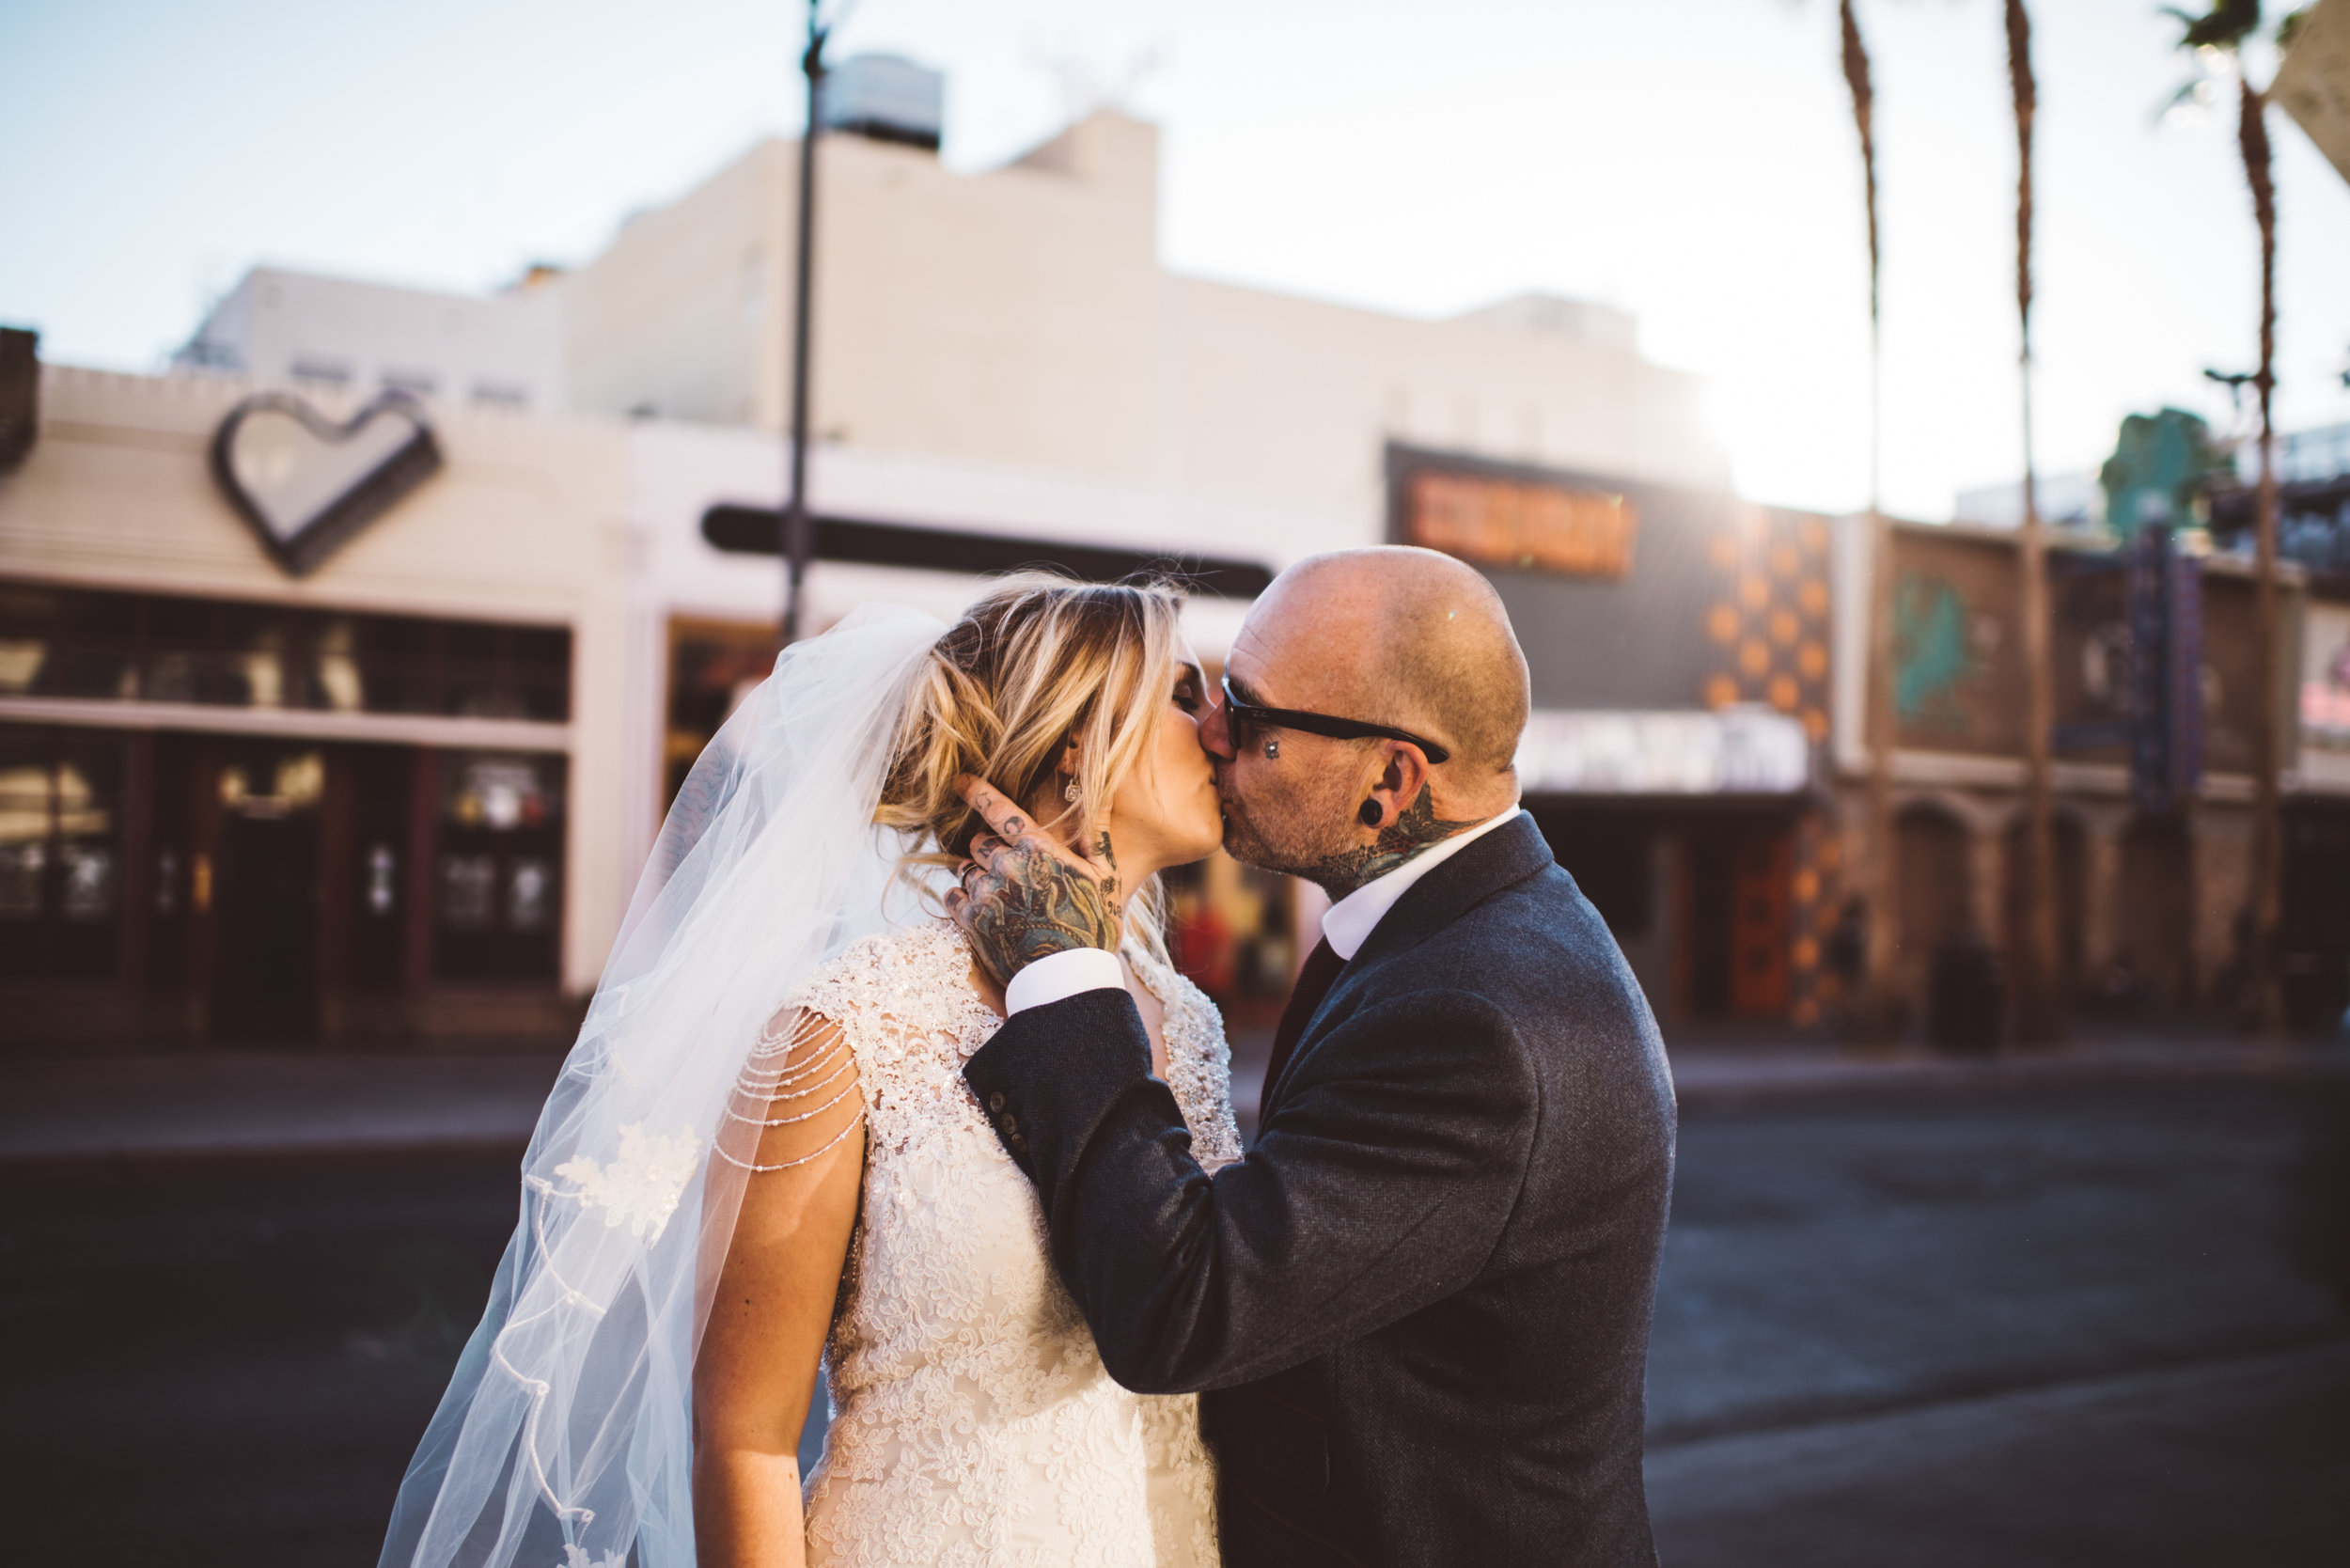 Las Vegas Elopement Photographer Ashley Marie Myers Rock'n Roll Bride-122.jpg